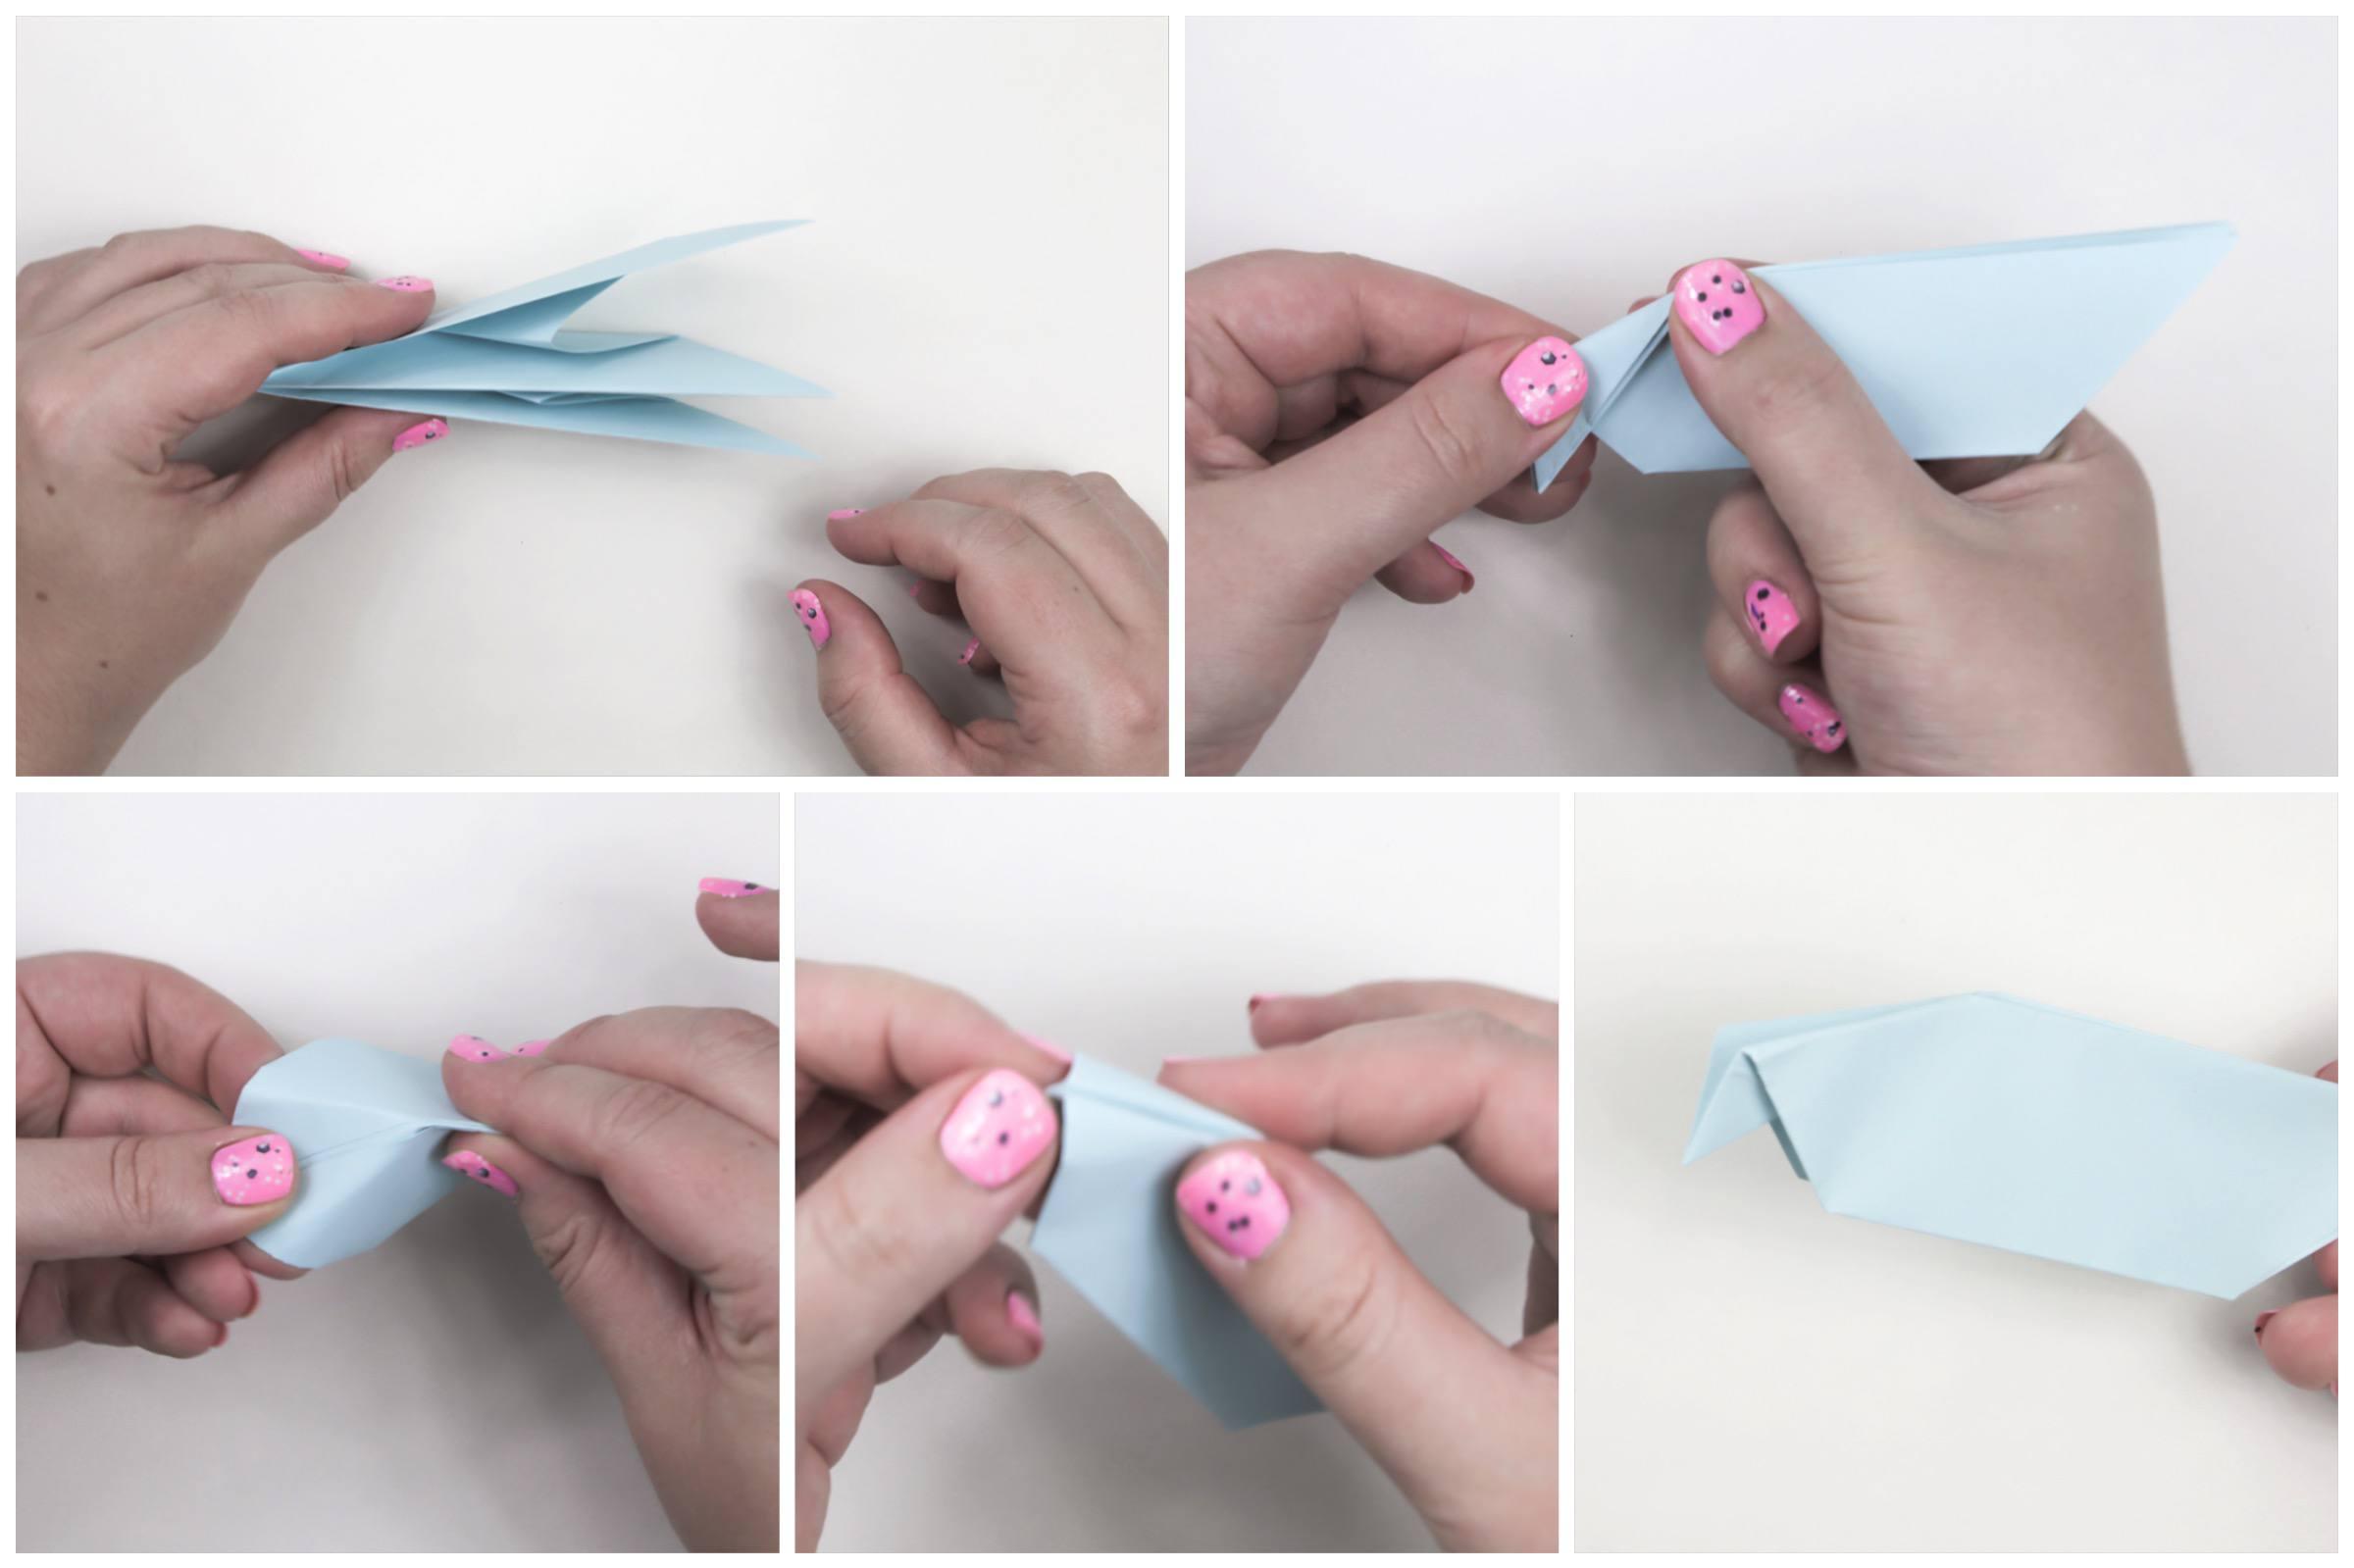 Making the beak of the origami peace dove